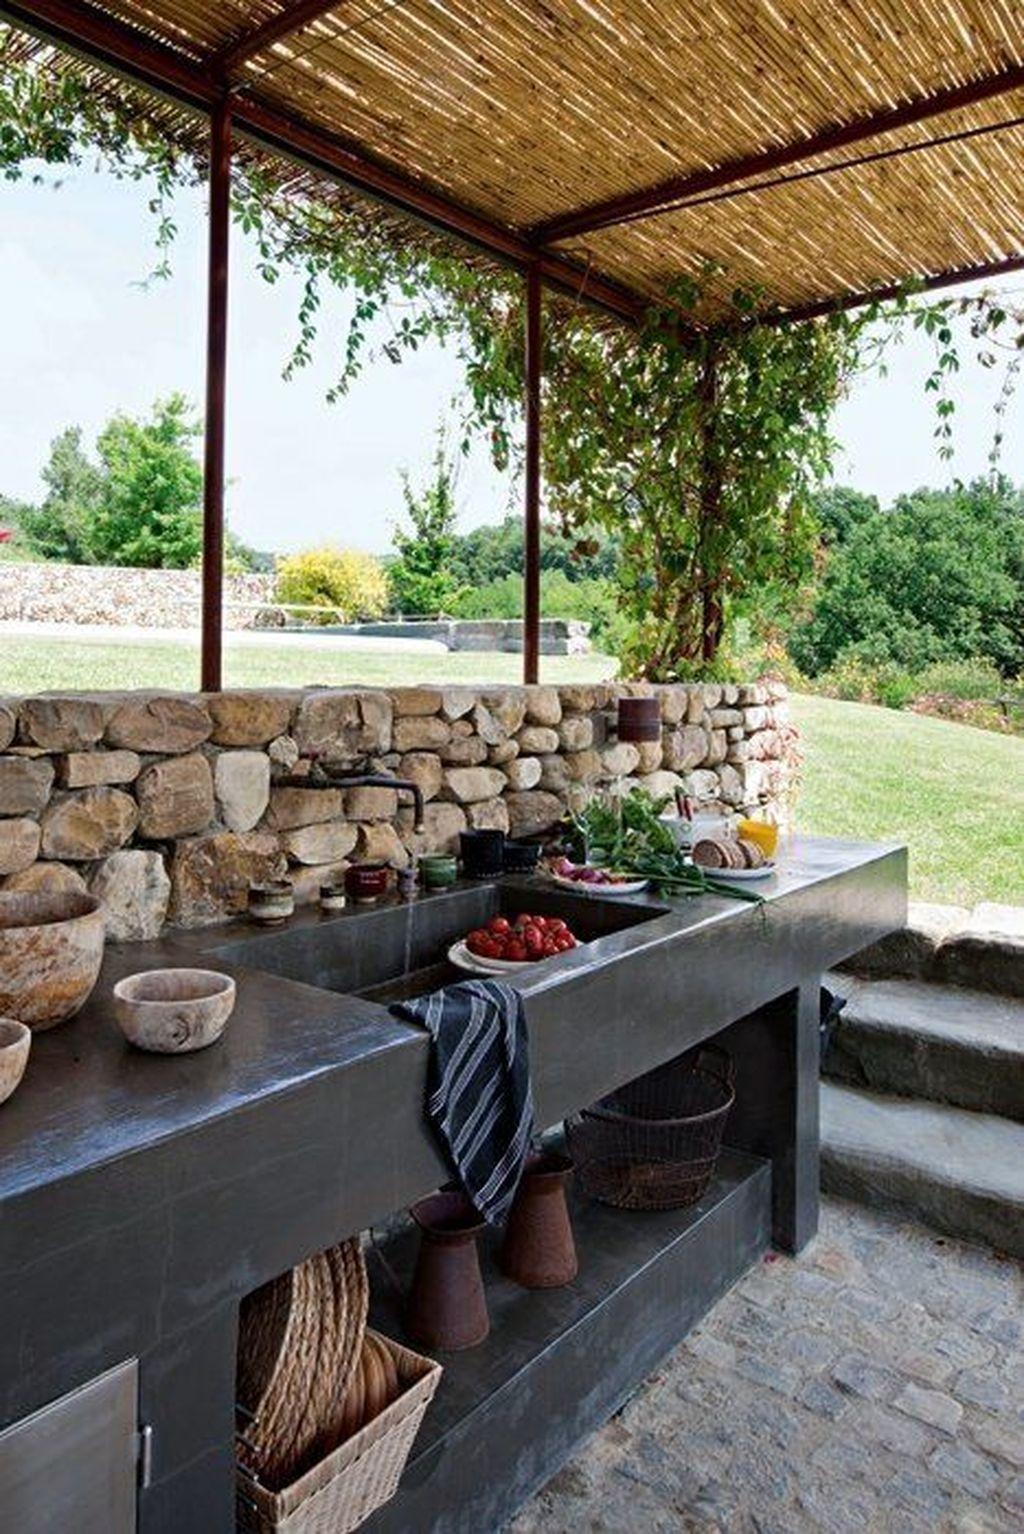 42 Stunning Summer Kitchen Outdoor Ideas | Cuisine Exterieur ... pour Évier Extérieur Jardin